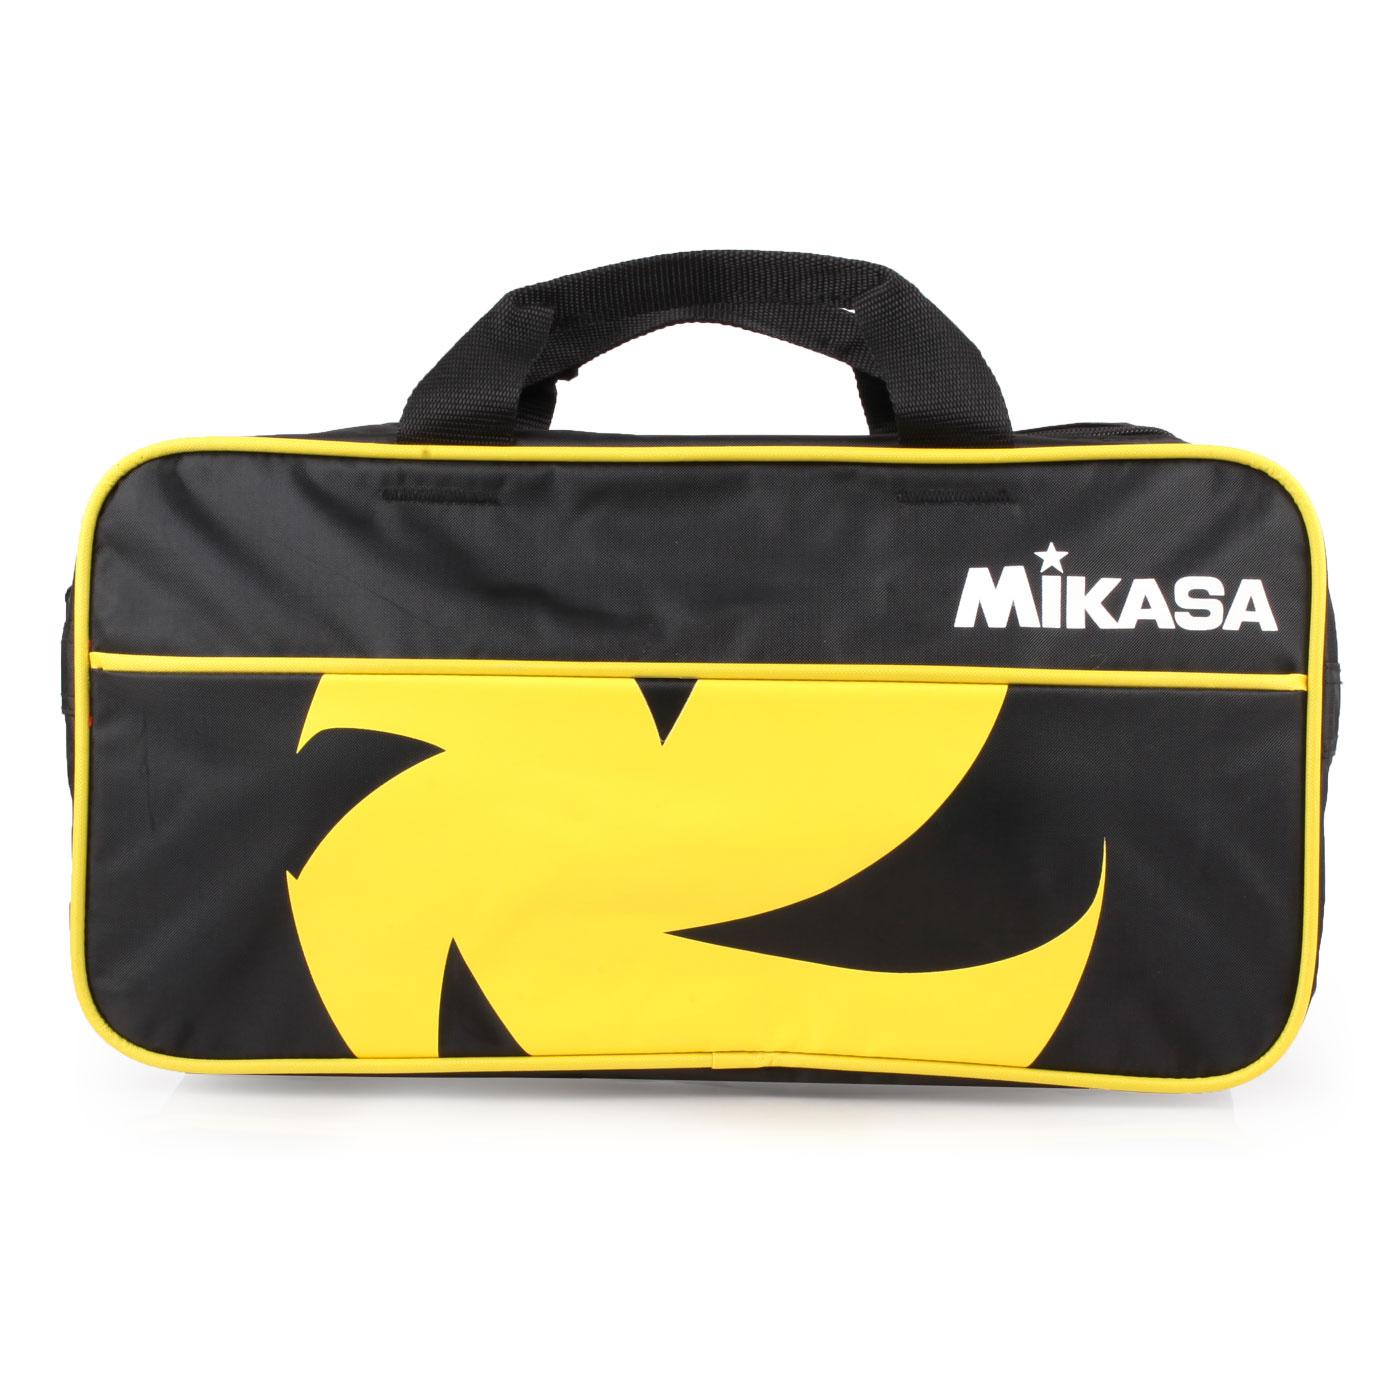 MIKASA 球袋-兩顆裝 MKVL2C-BKY - 黑黃白